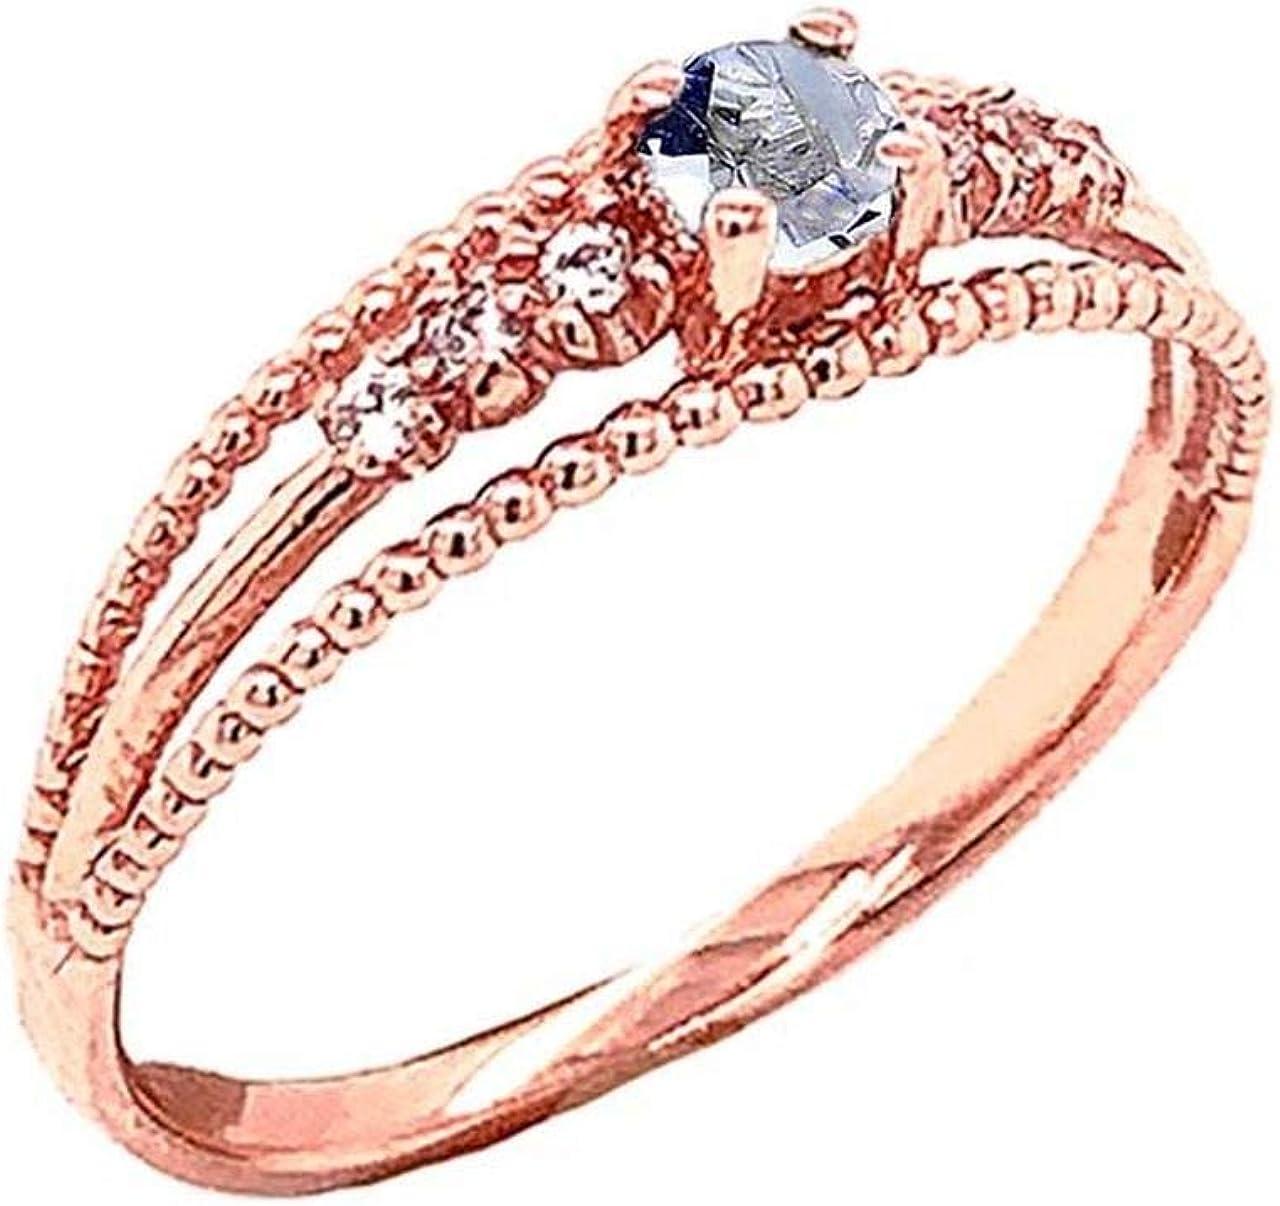 Certified 10k Gold Genuine Aquamarine and Diamond Modern Engagem SALENEW大人気 ◆高品質